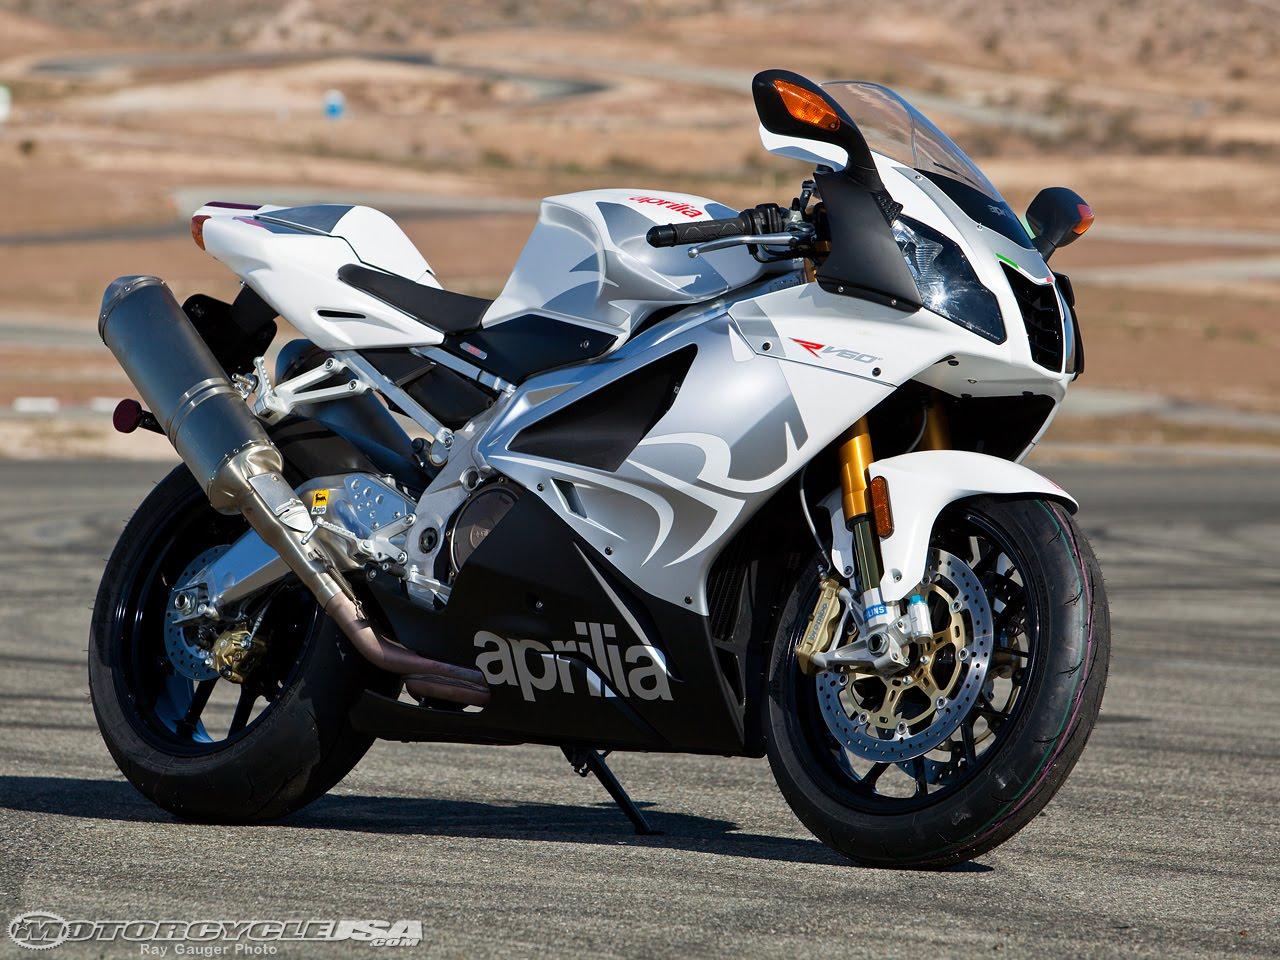 2010 Aprilia RSV 1000 R Motorcycle title=